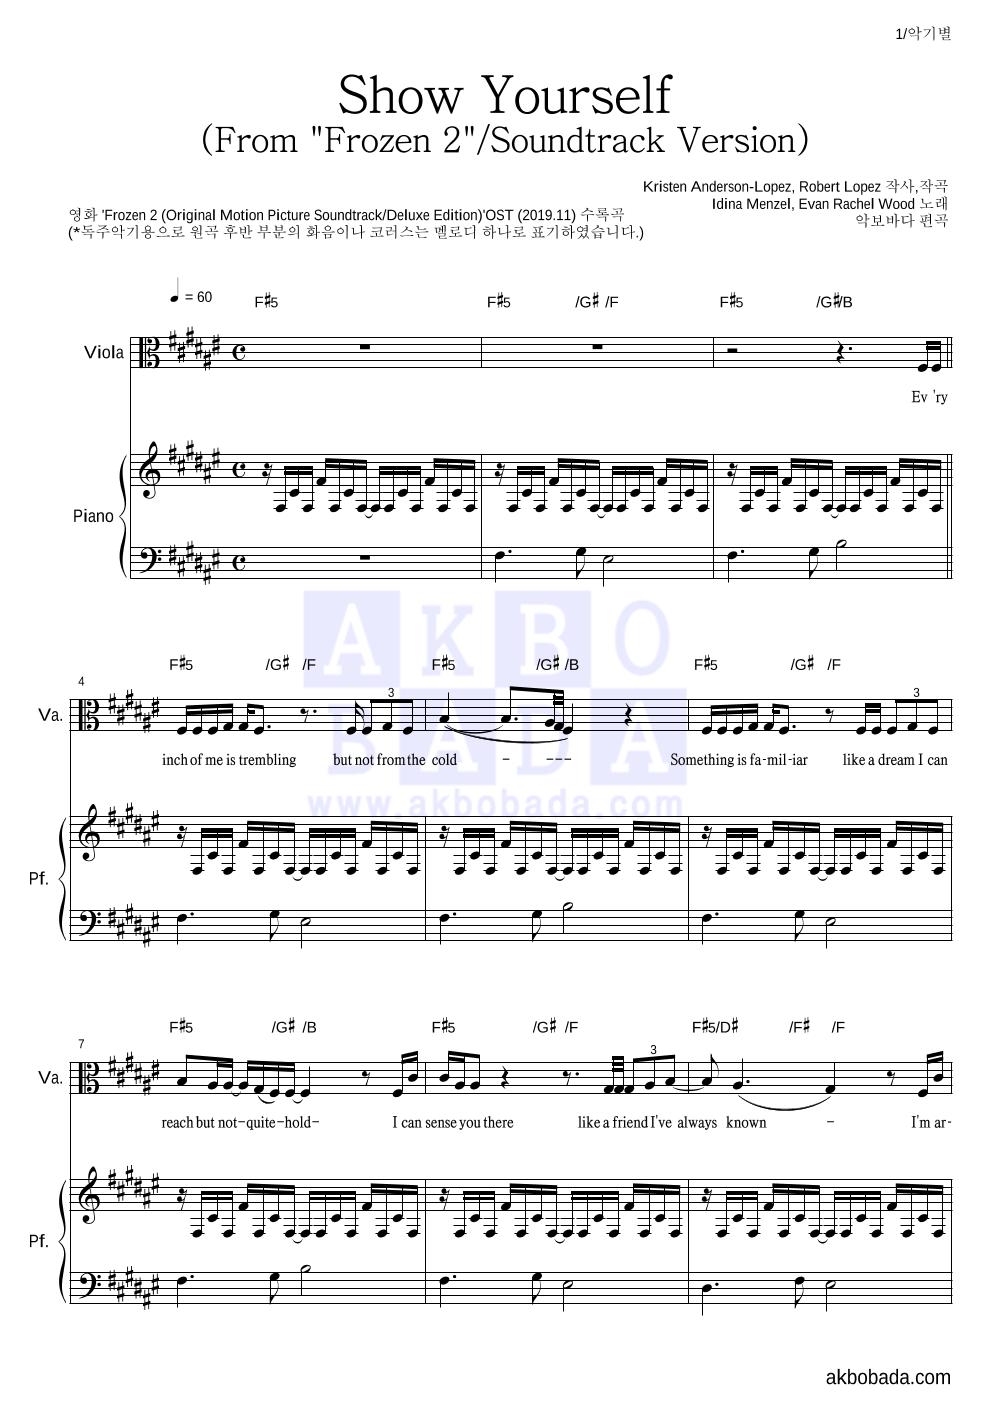 Idina Menzel, Evan Rachel Wood - Show Yourself 비올라&피아노 악보